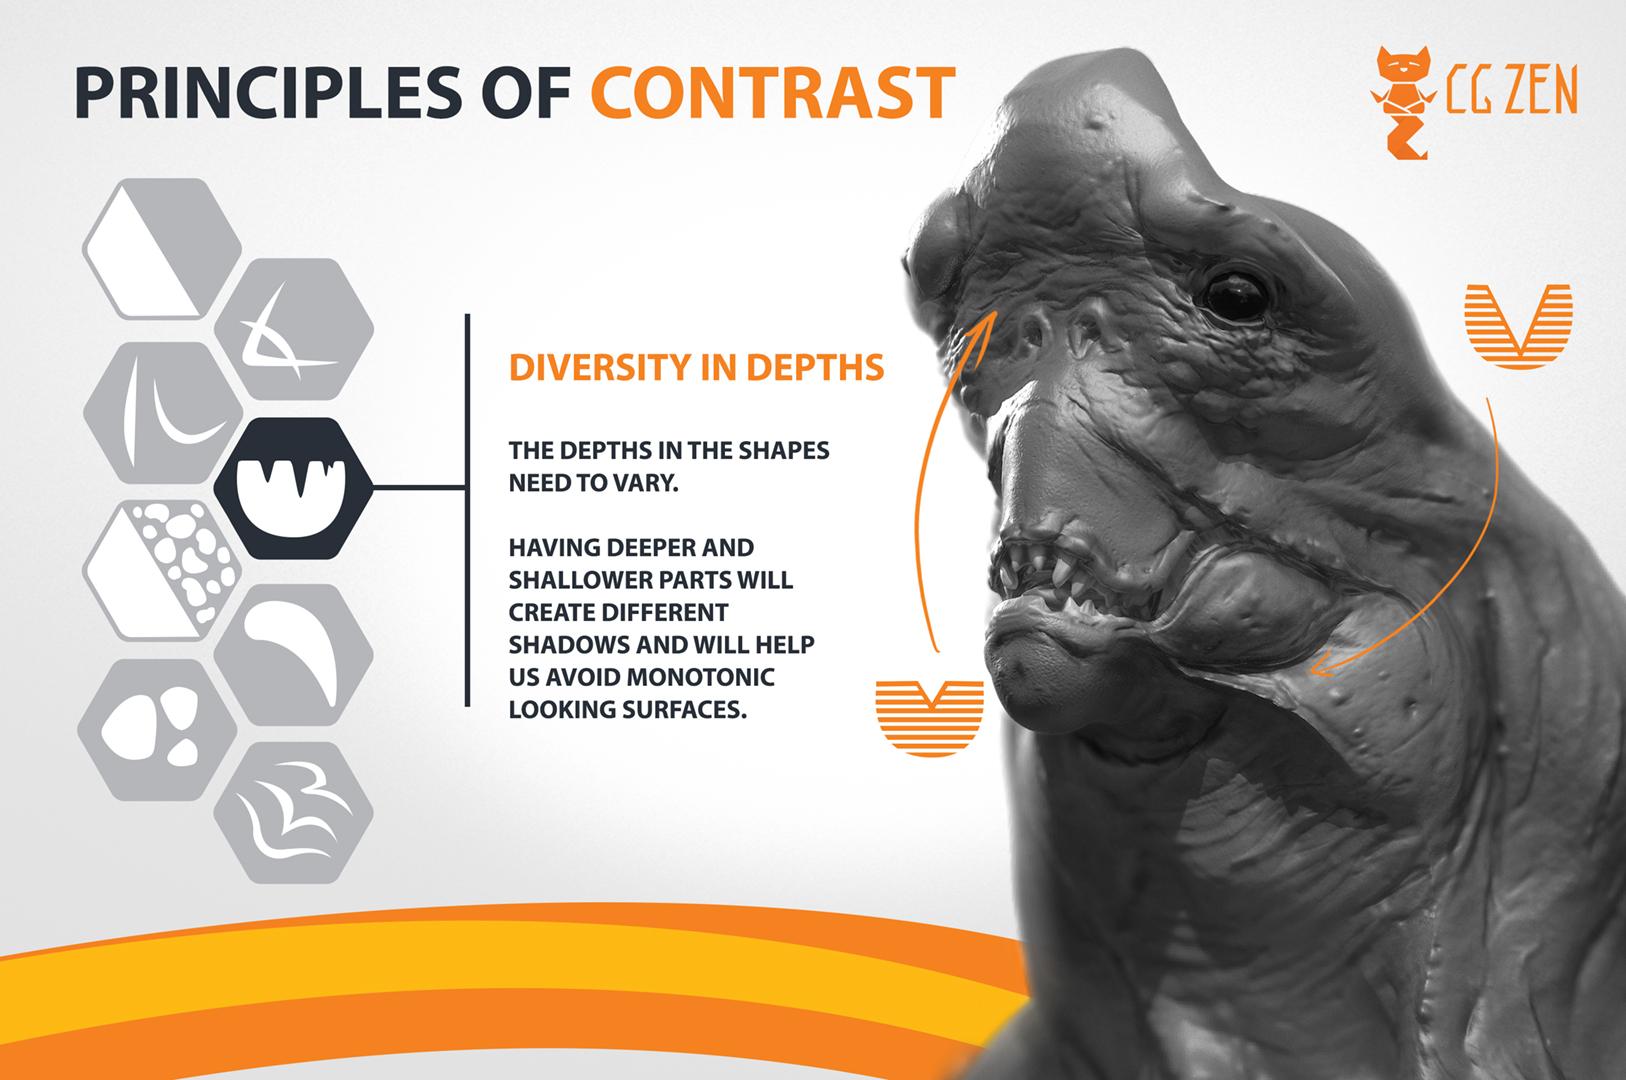 04-contrast-design-diffrent-depth-cgzen-EN